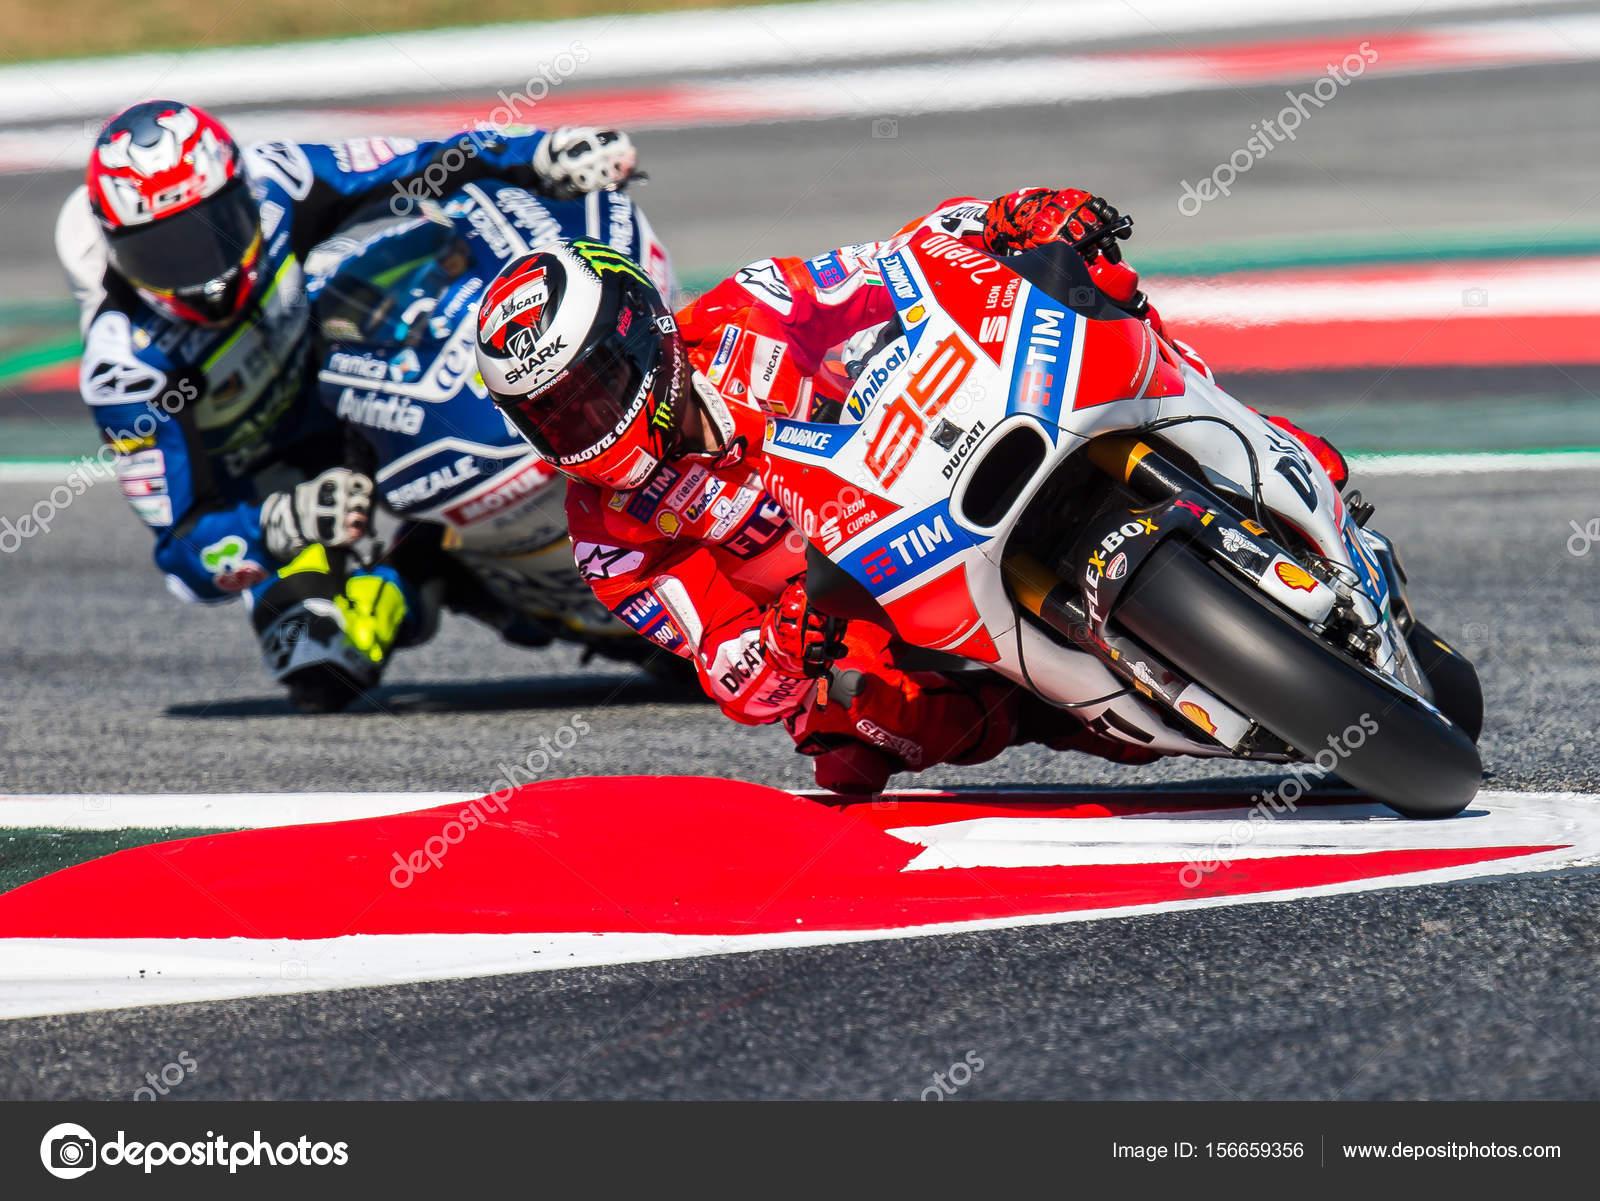 Gp Catalunya Moto Gp Jorge Lorenzo Team Ducati Stock Editorial